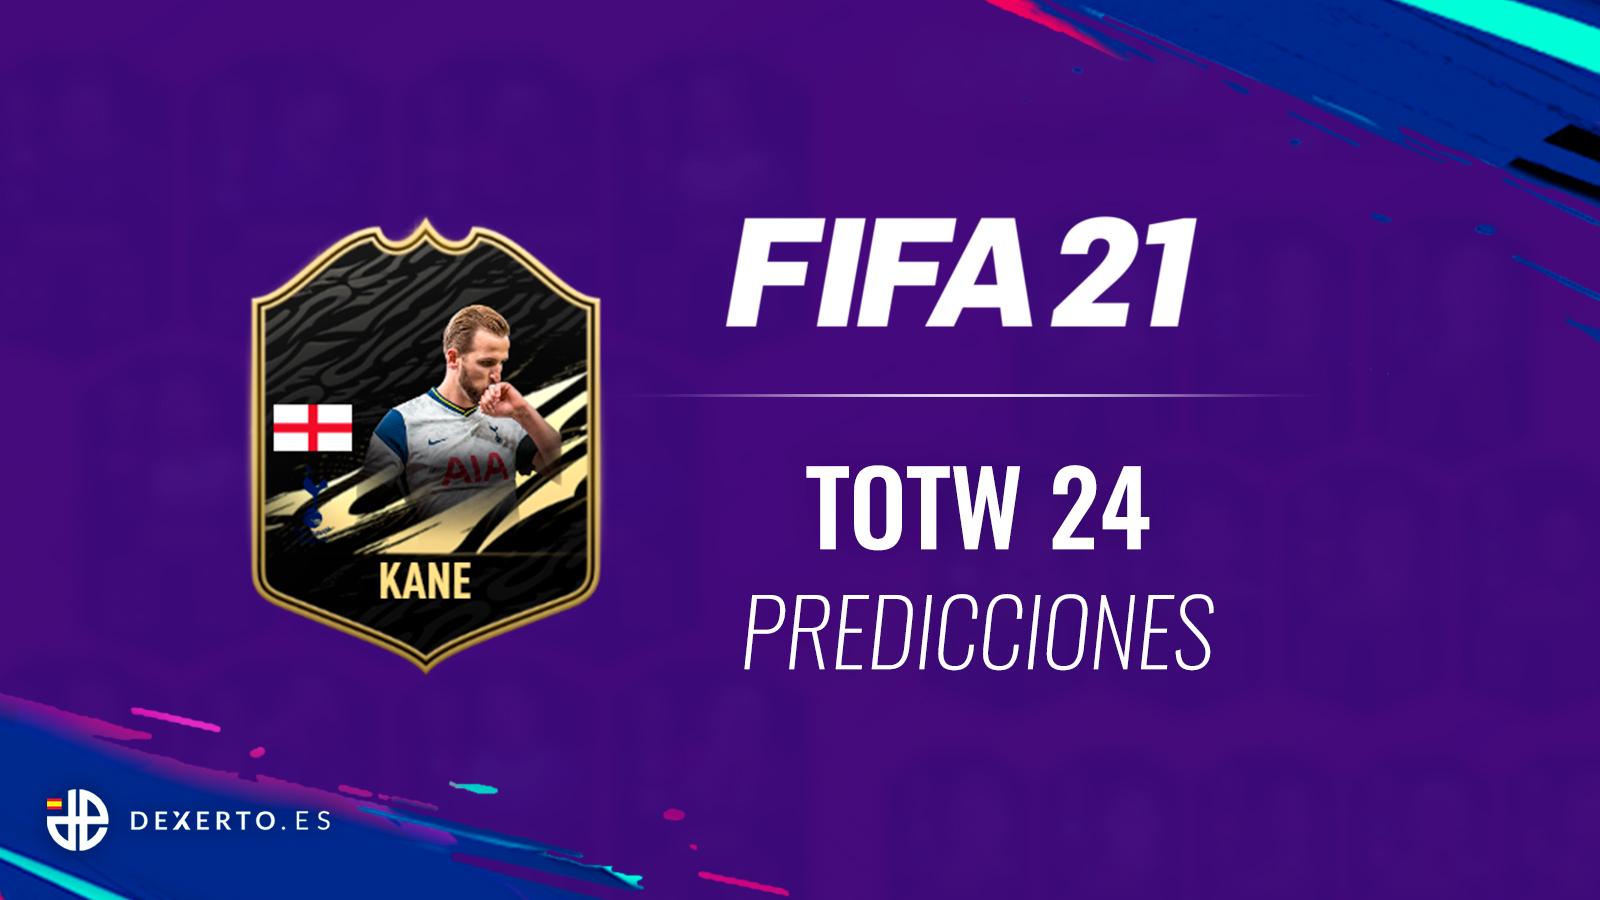 KANE predicciones FIFA 21 TOTW 24